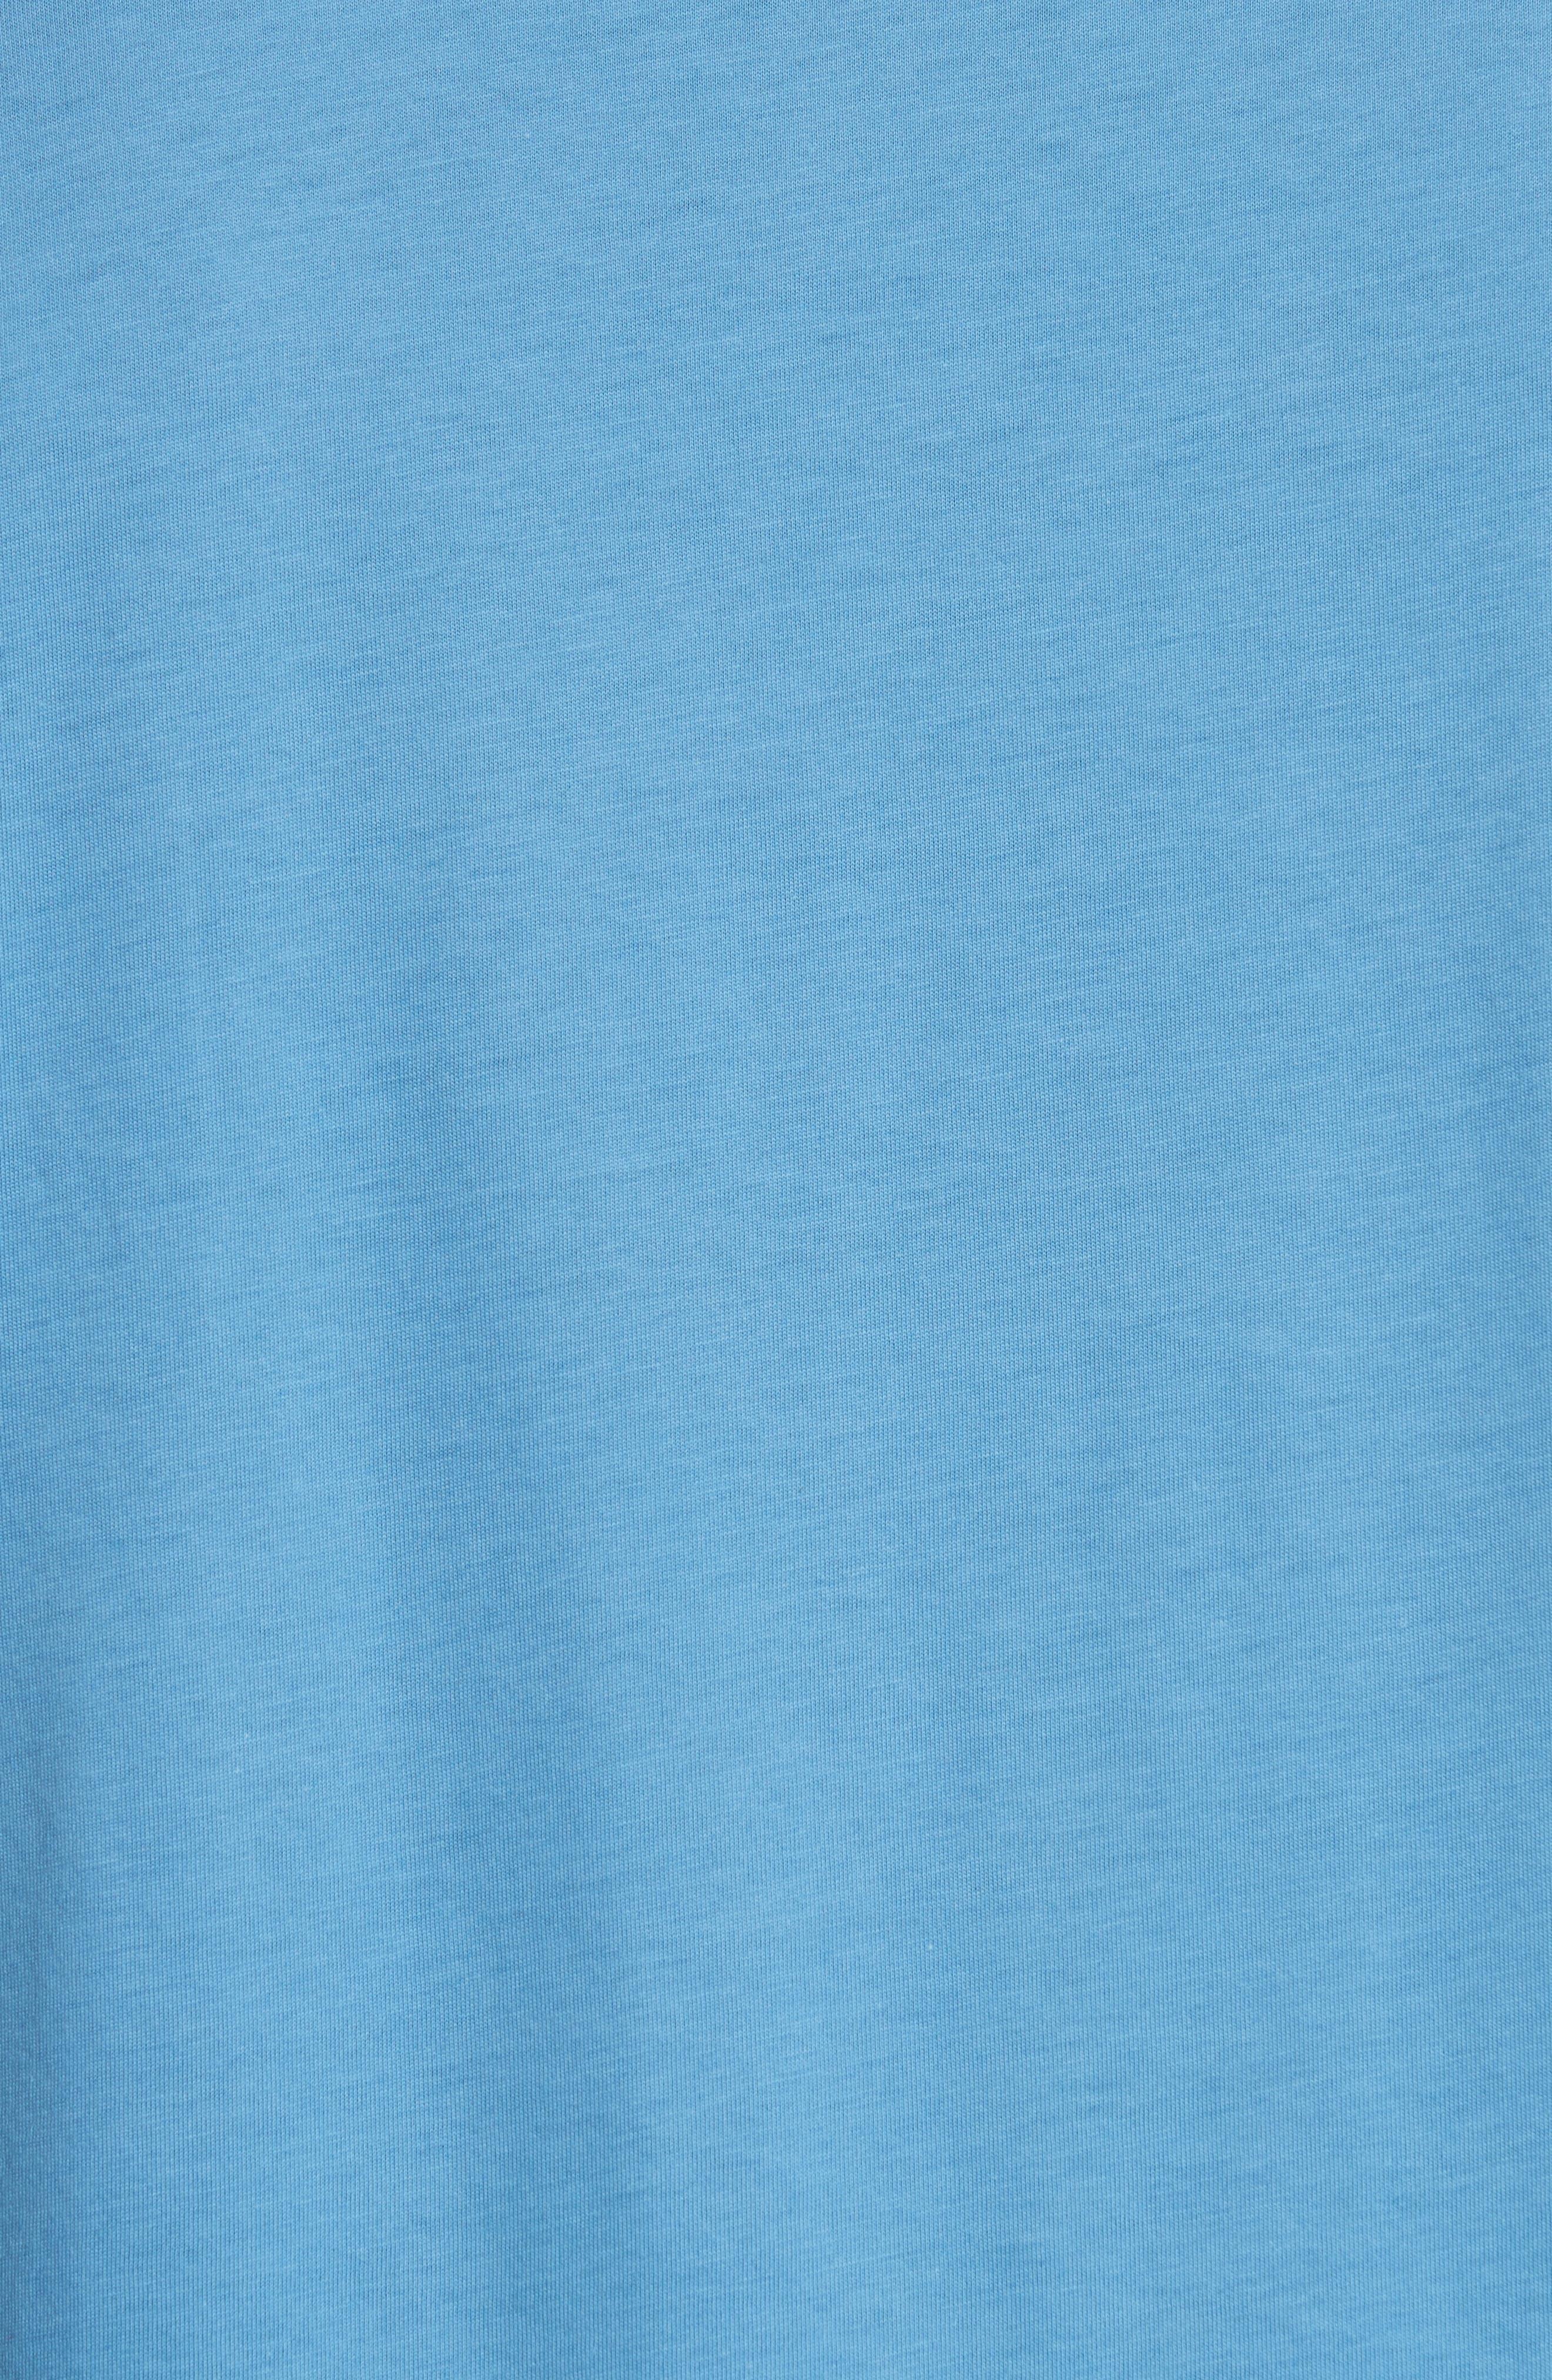 Jadford Standard Fit V-Neck Tee,                             Alternate thumbnail 5, color,                             Light Azure